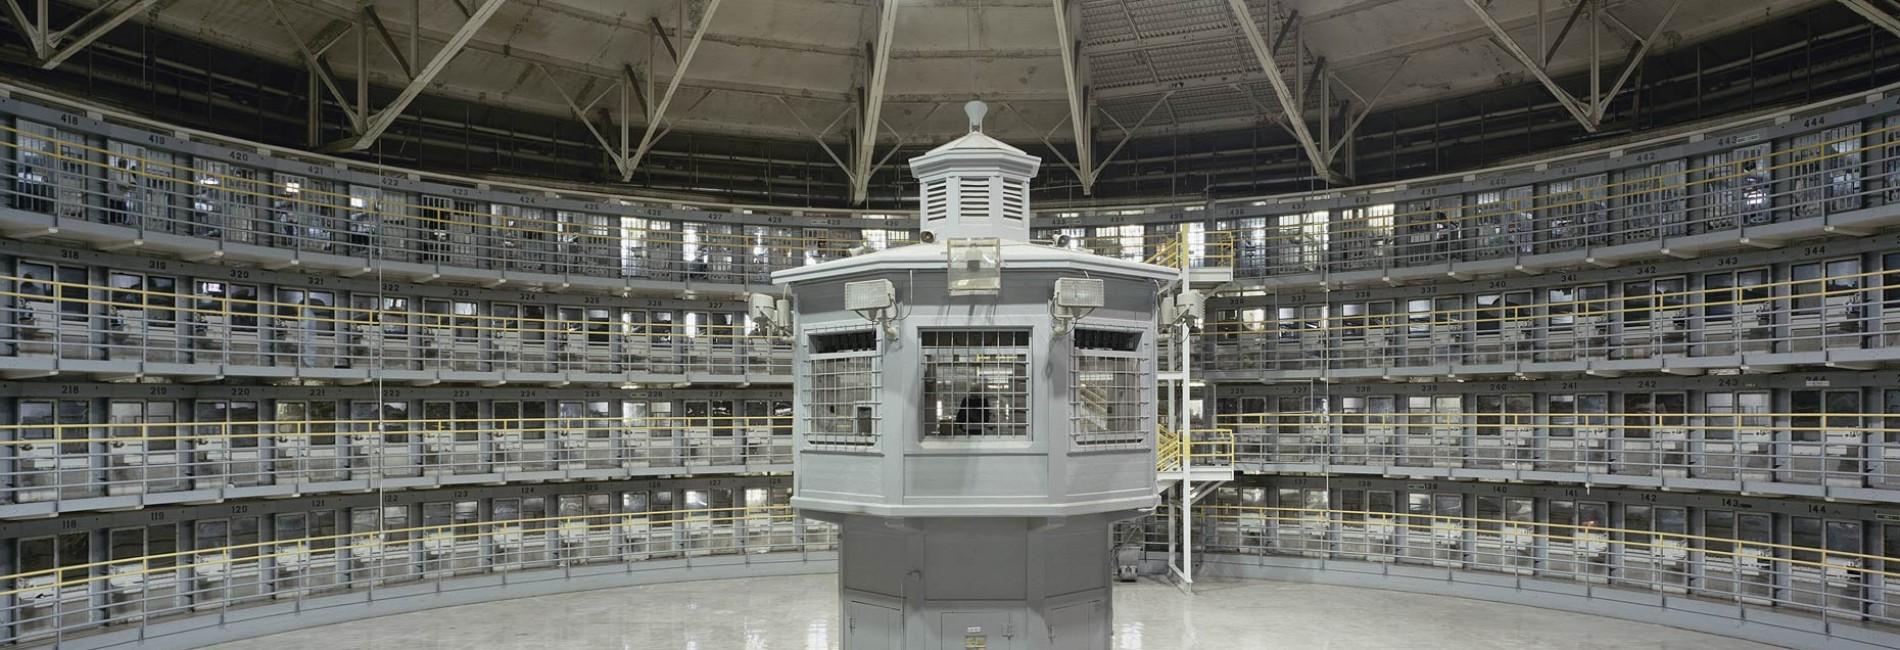 statevilleprison2